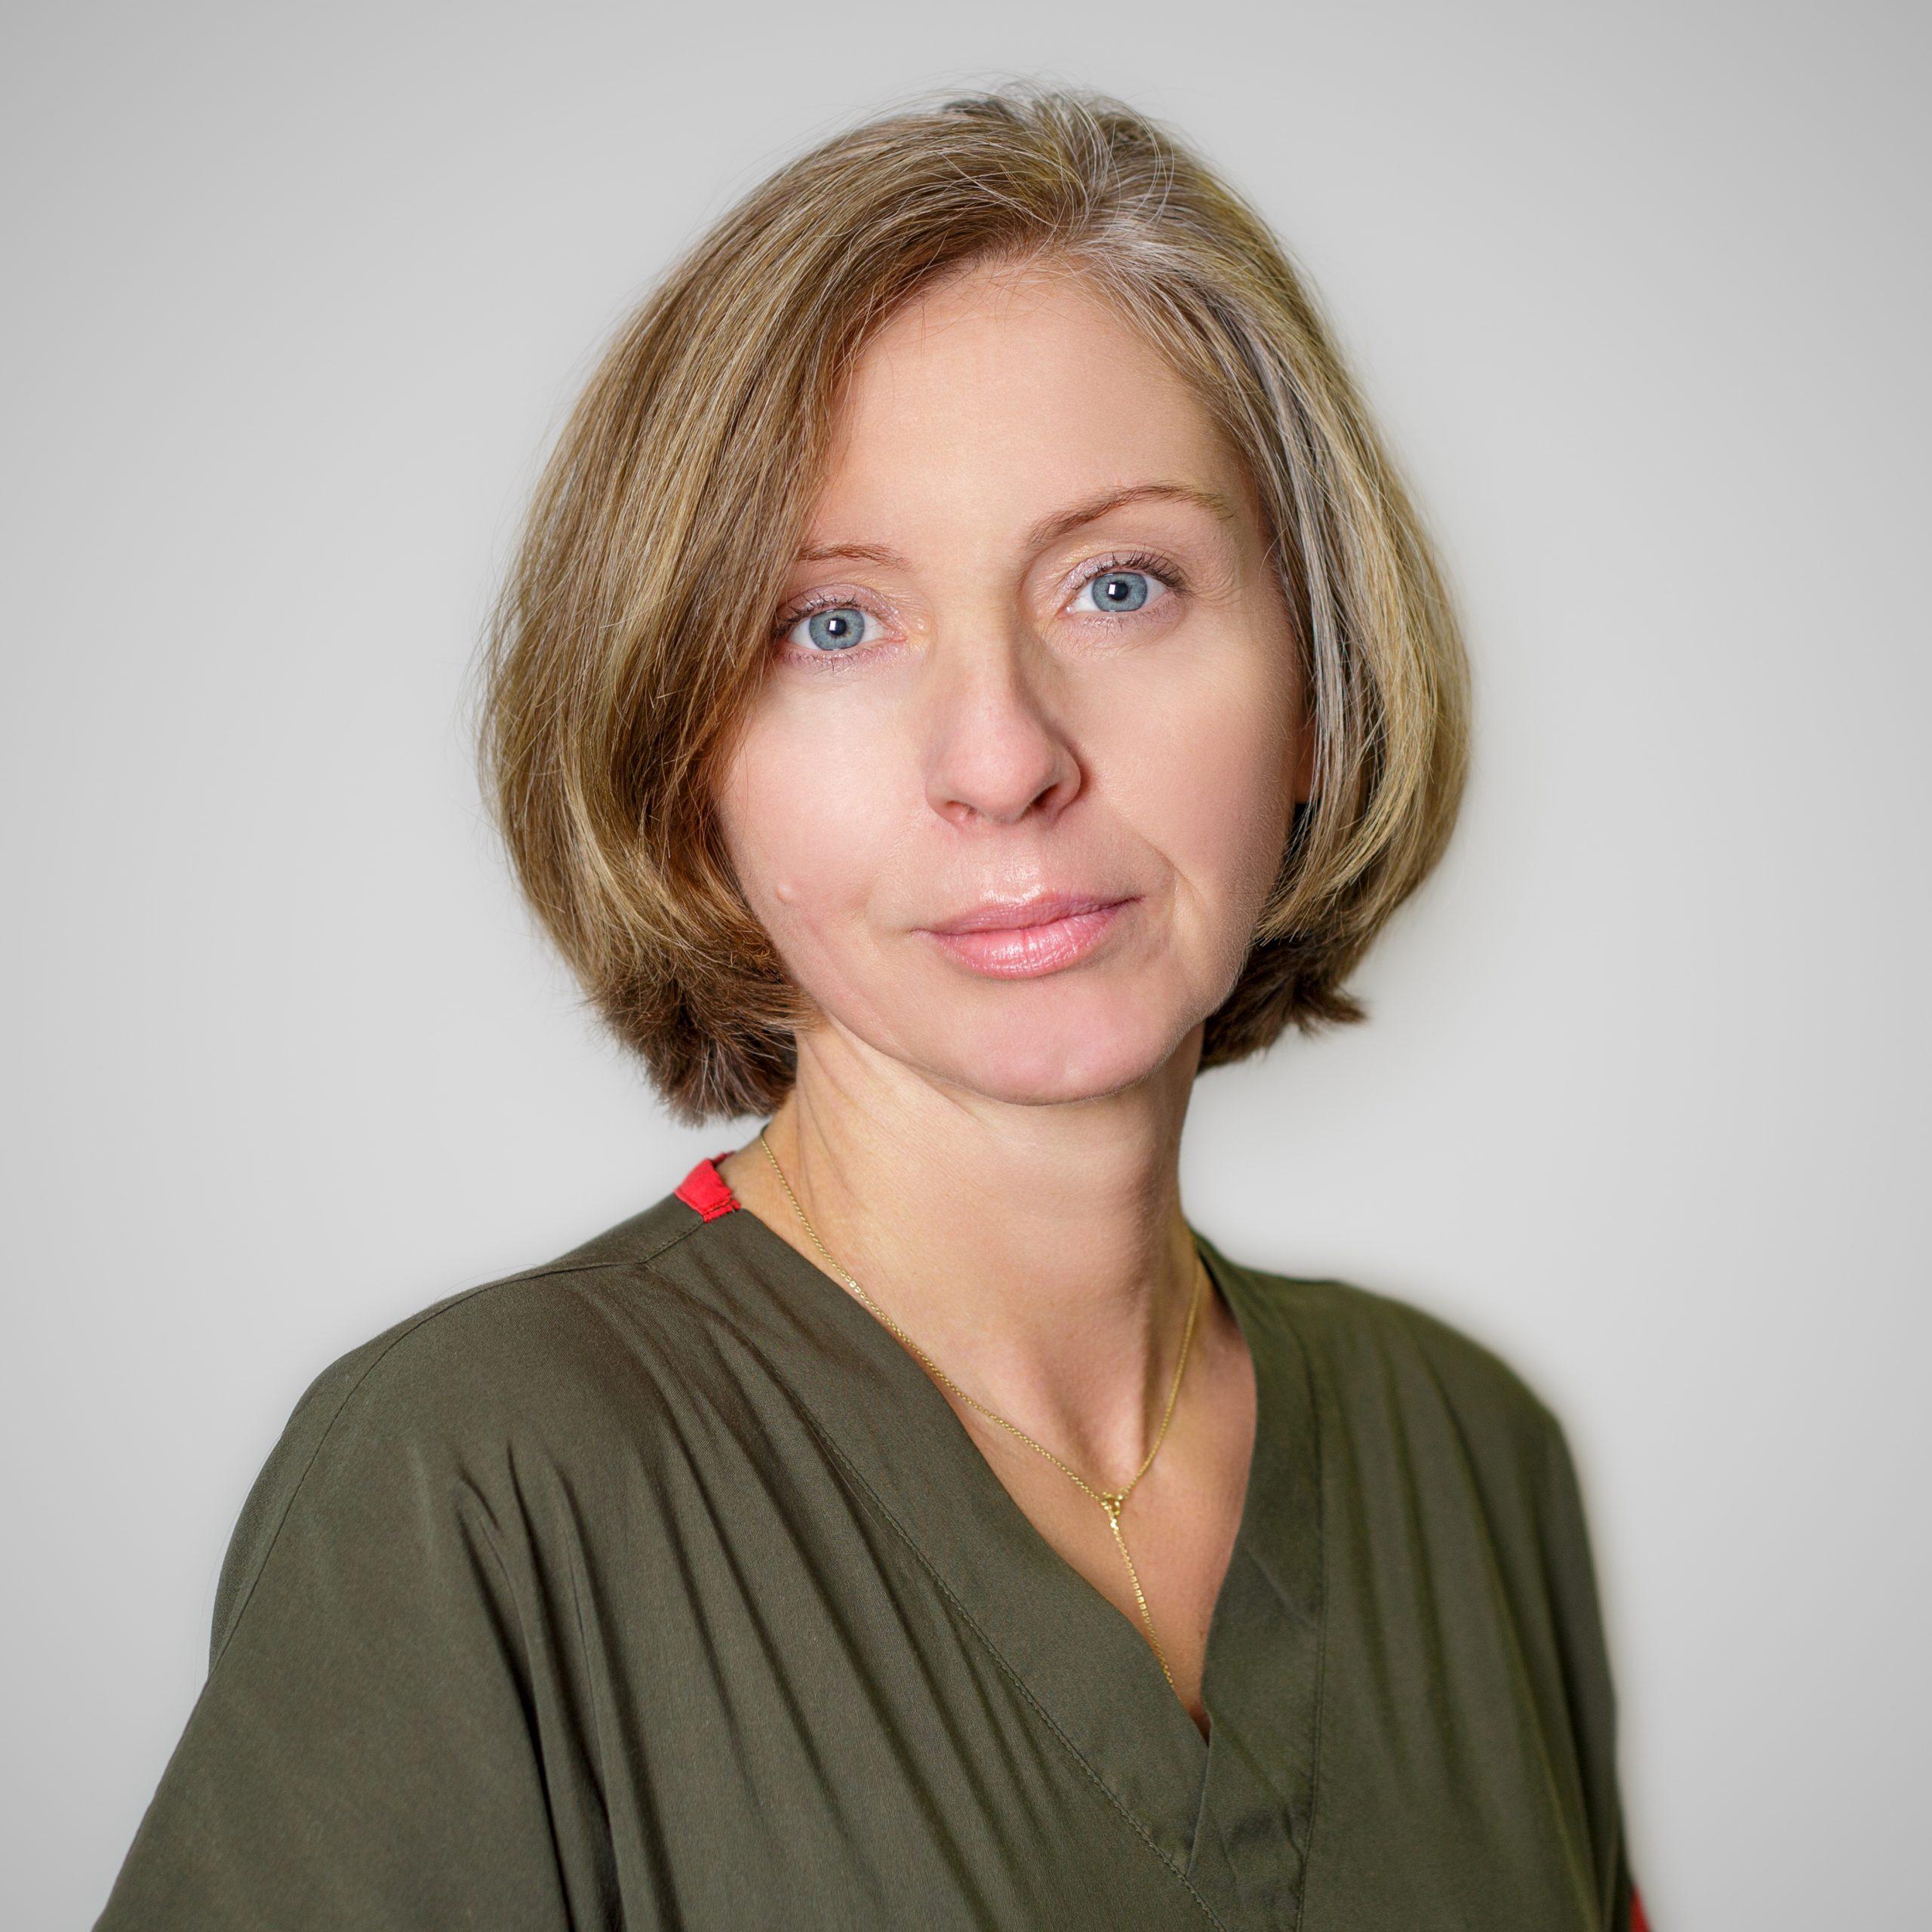 Gintarė Ščebedaitė - Vickun